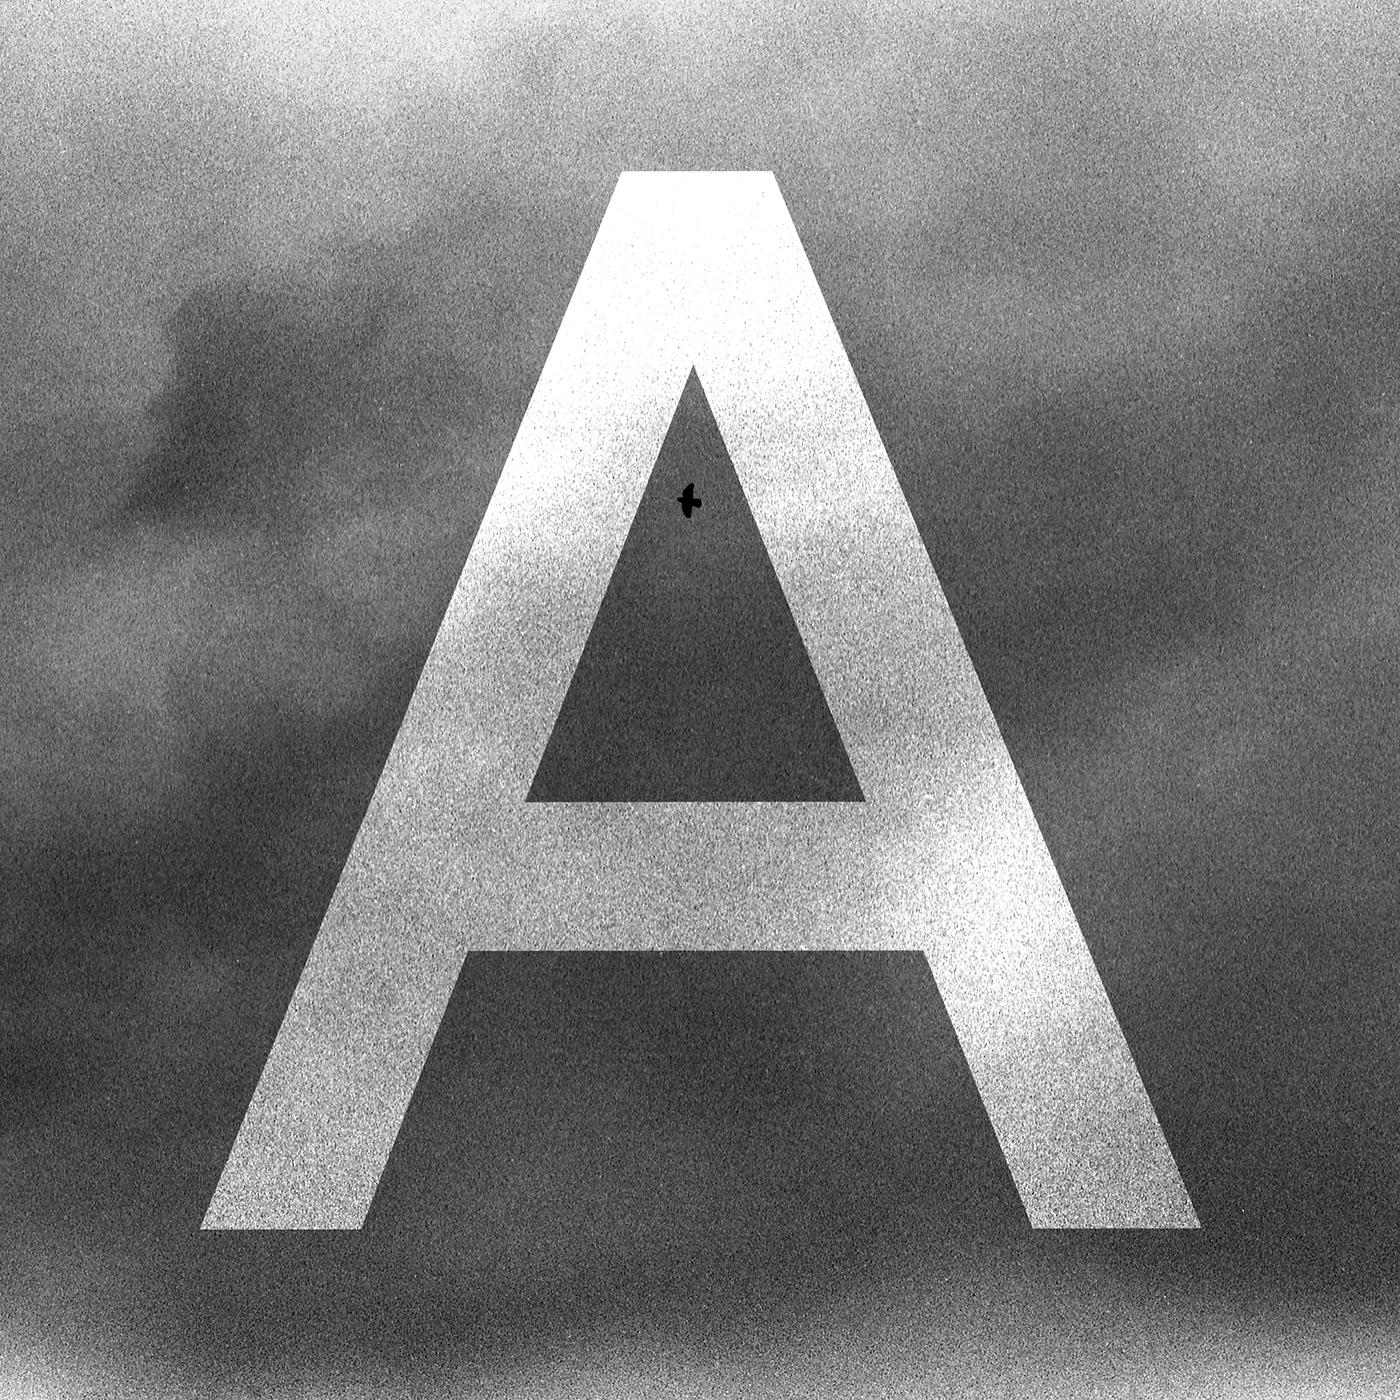 Capital A Photographic Illuminated Capital. Film photograph with digital manipulation.